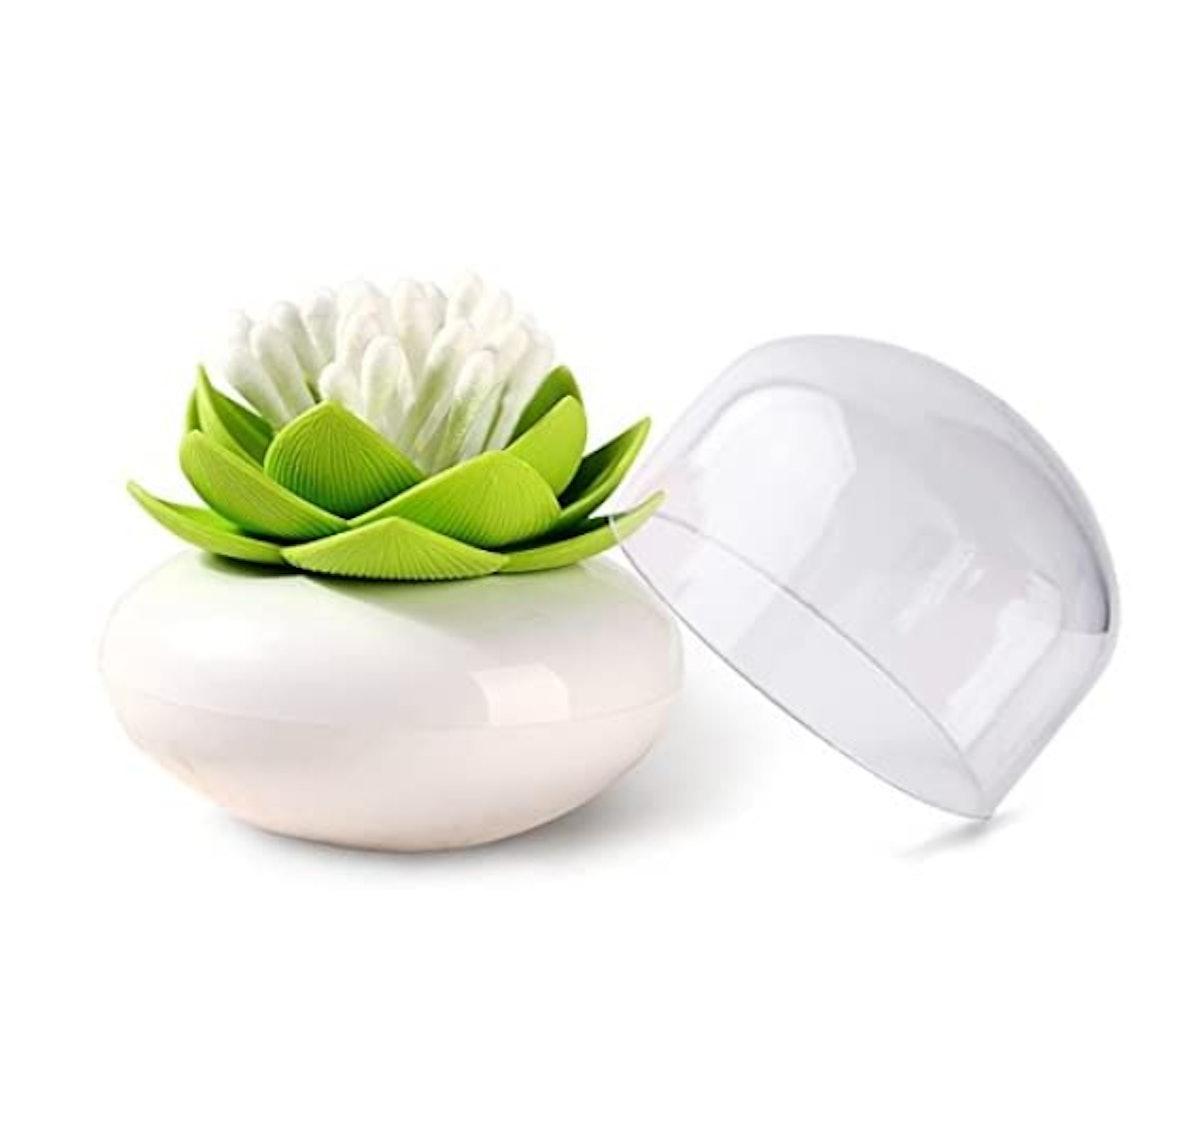 MelonBoat Lotus Cotton Swab Holder